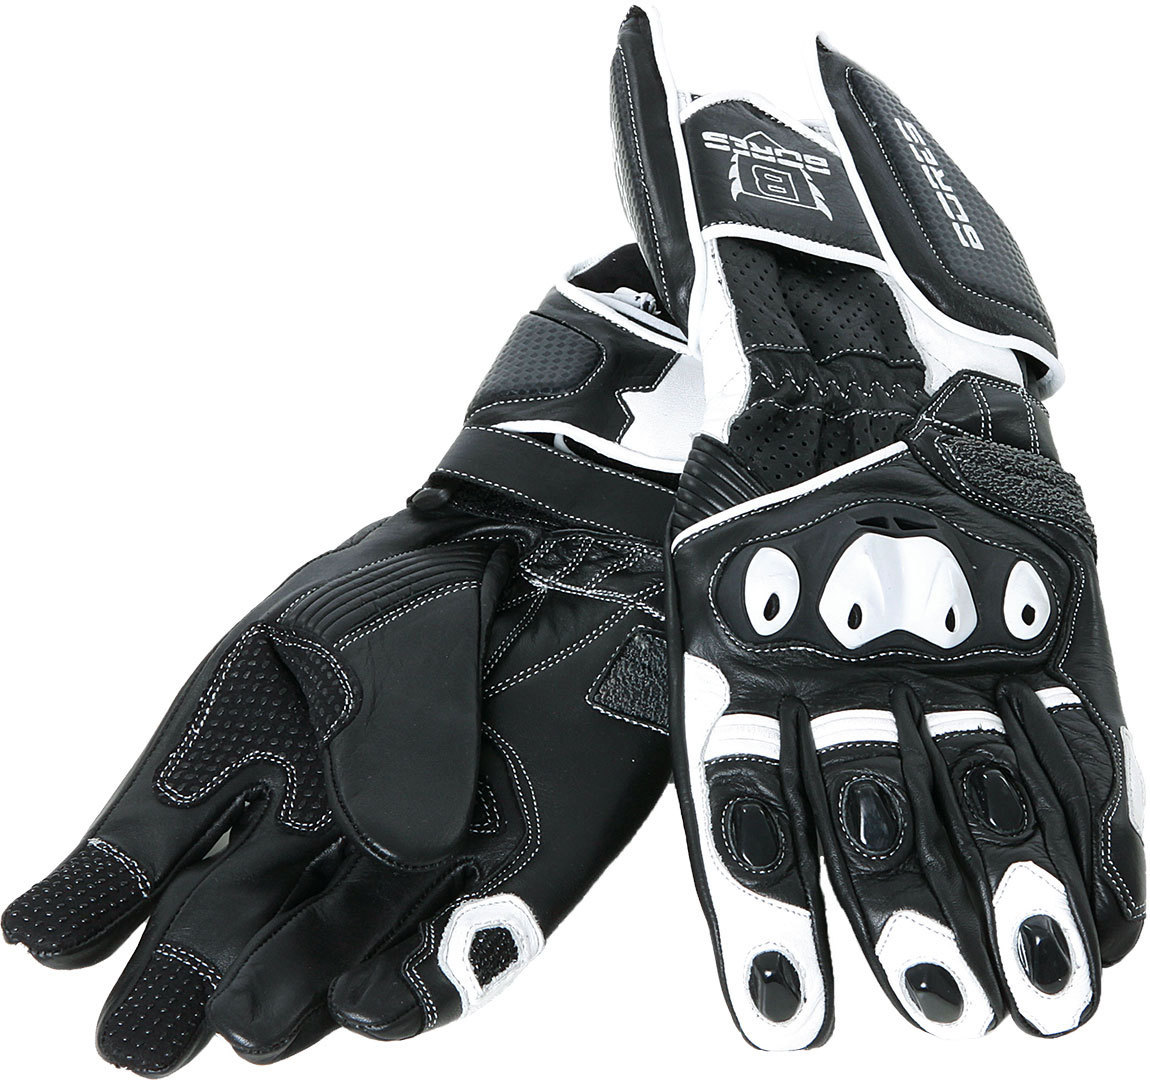 Bores Race Handschuhe, schwarz-weiss, Größe M L, schwarz-weiss, Größe M L